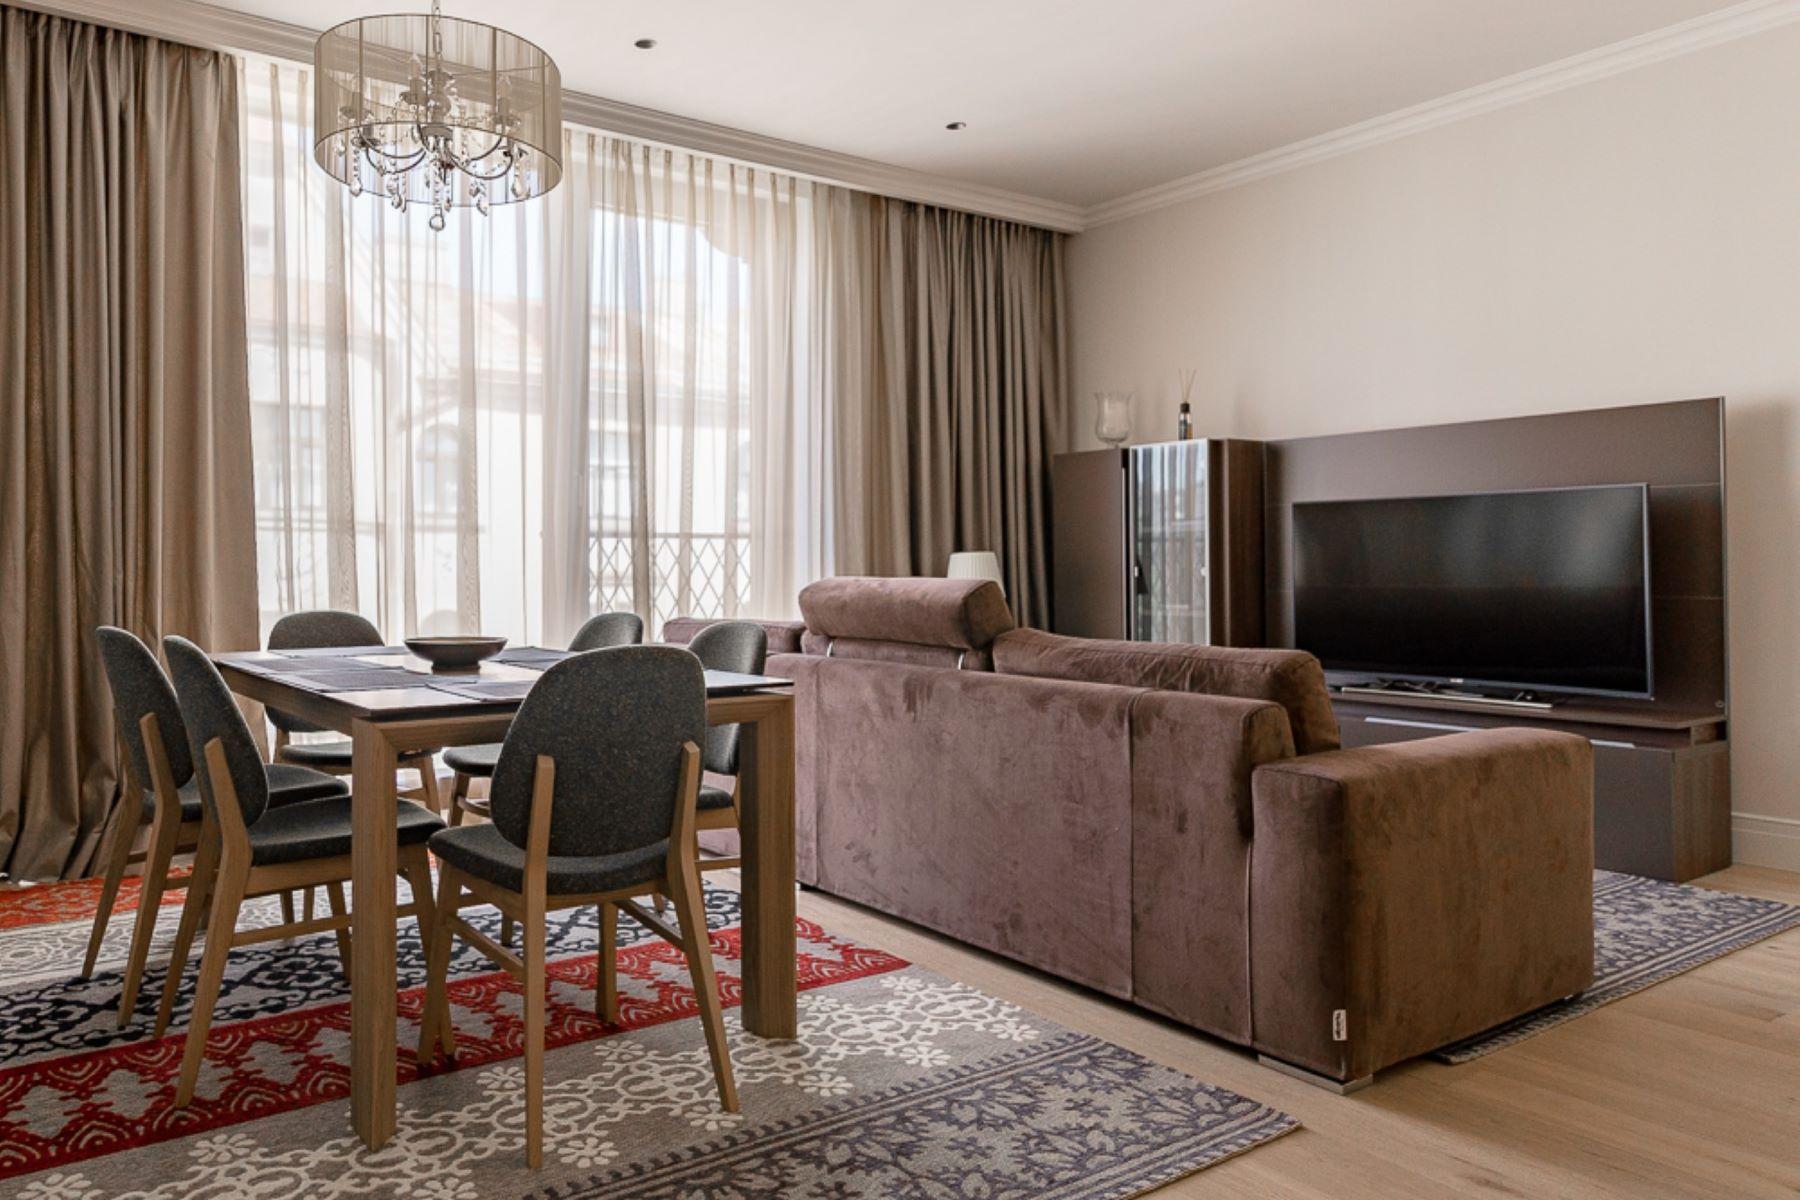 Apartments 为 销售 在 Modern apartment in a club buildng 其他国家